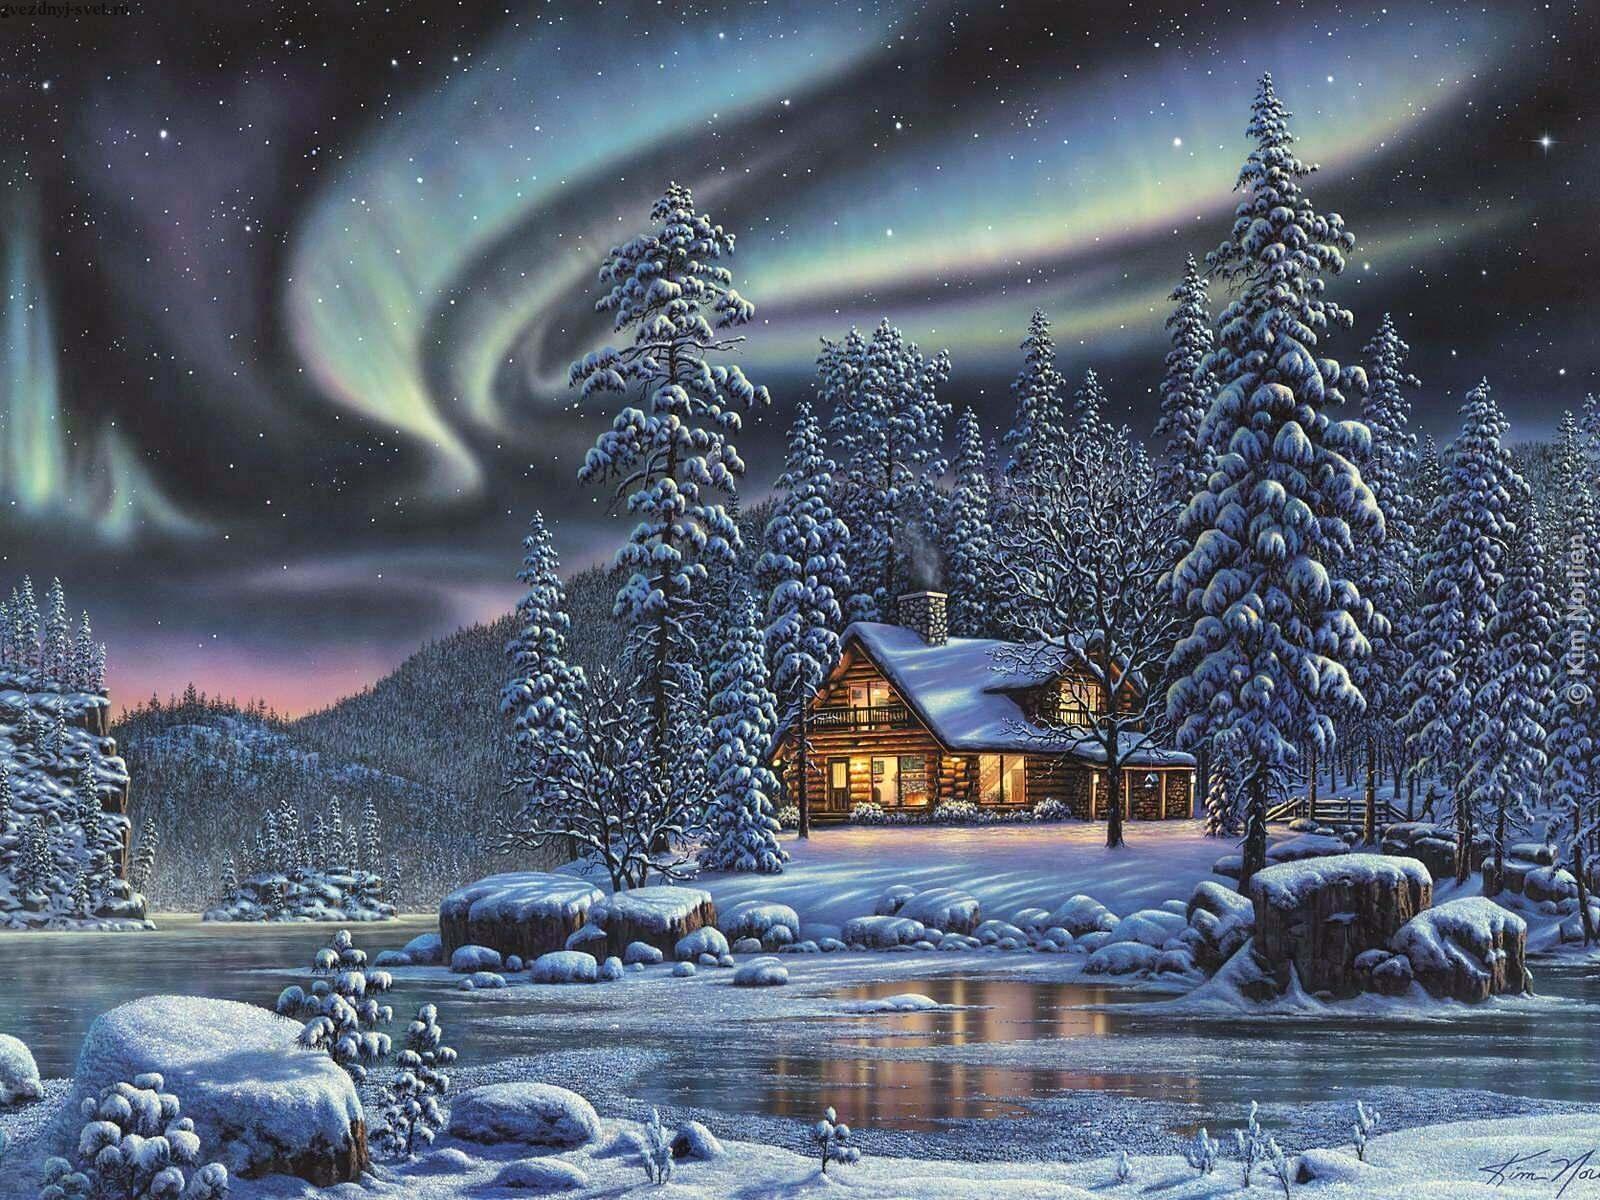 Alaskan Winter Night Painting.jpg